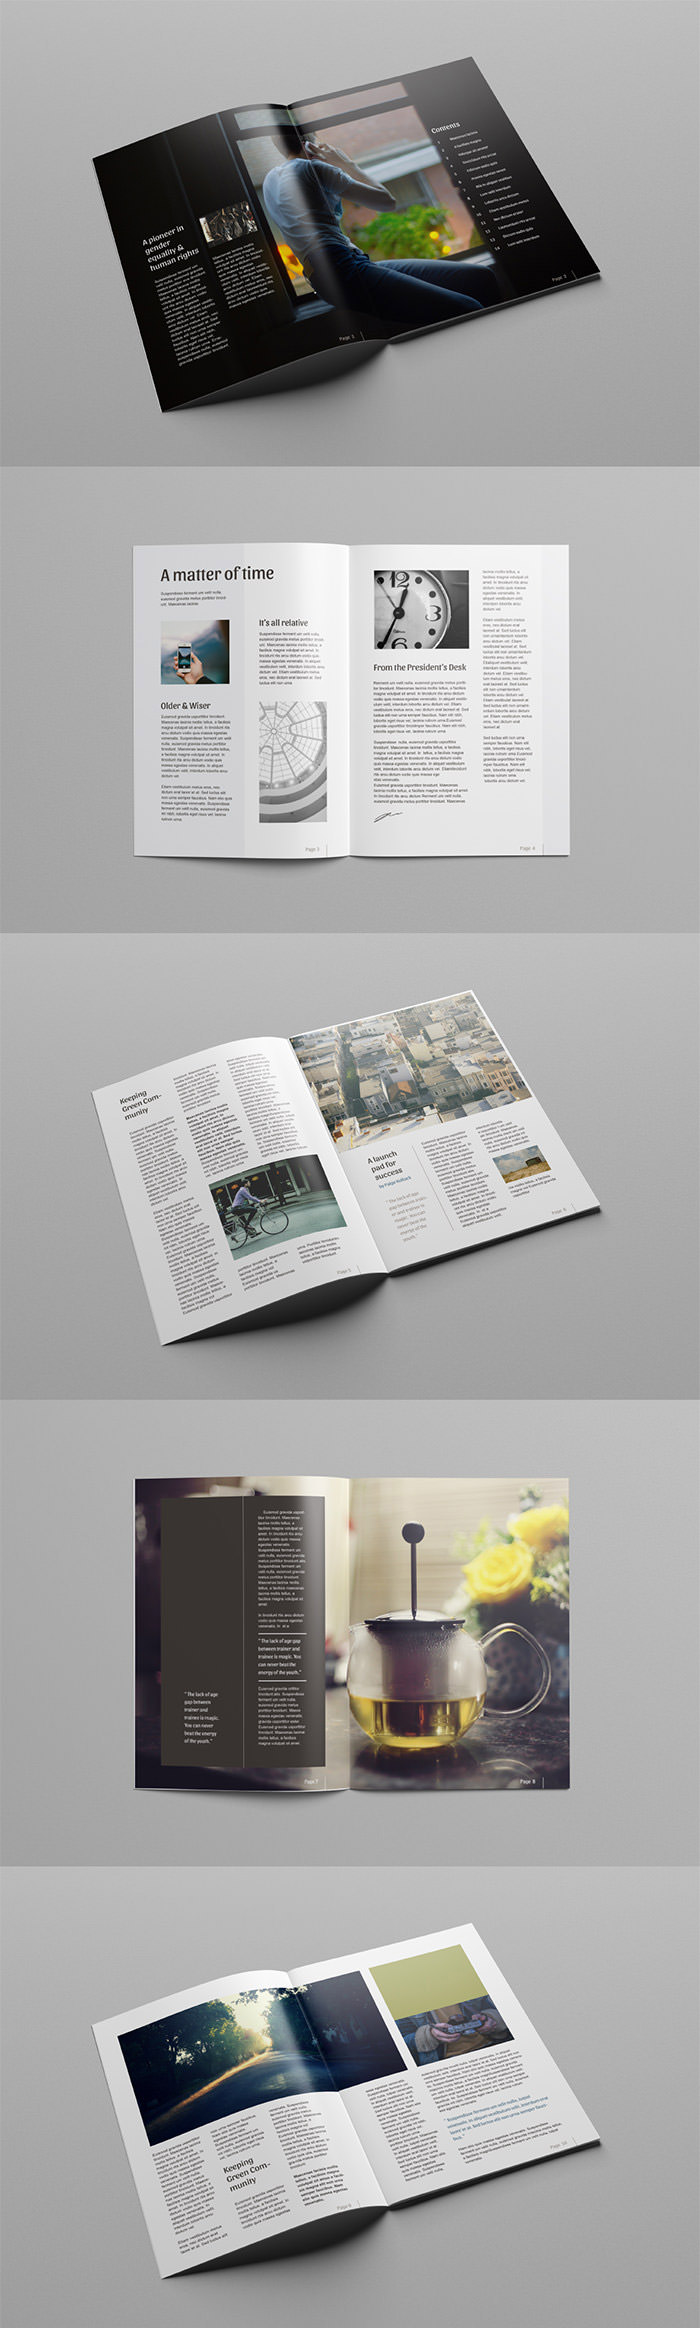 magazine-template-v2-0